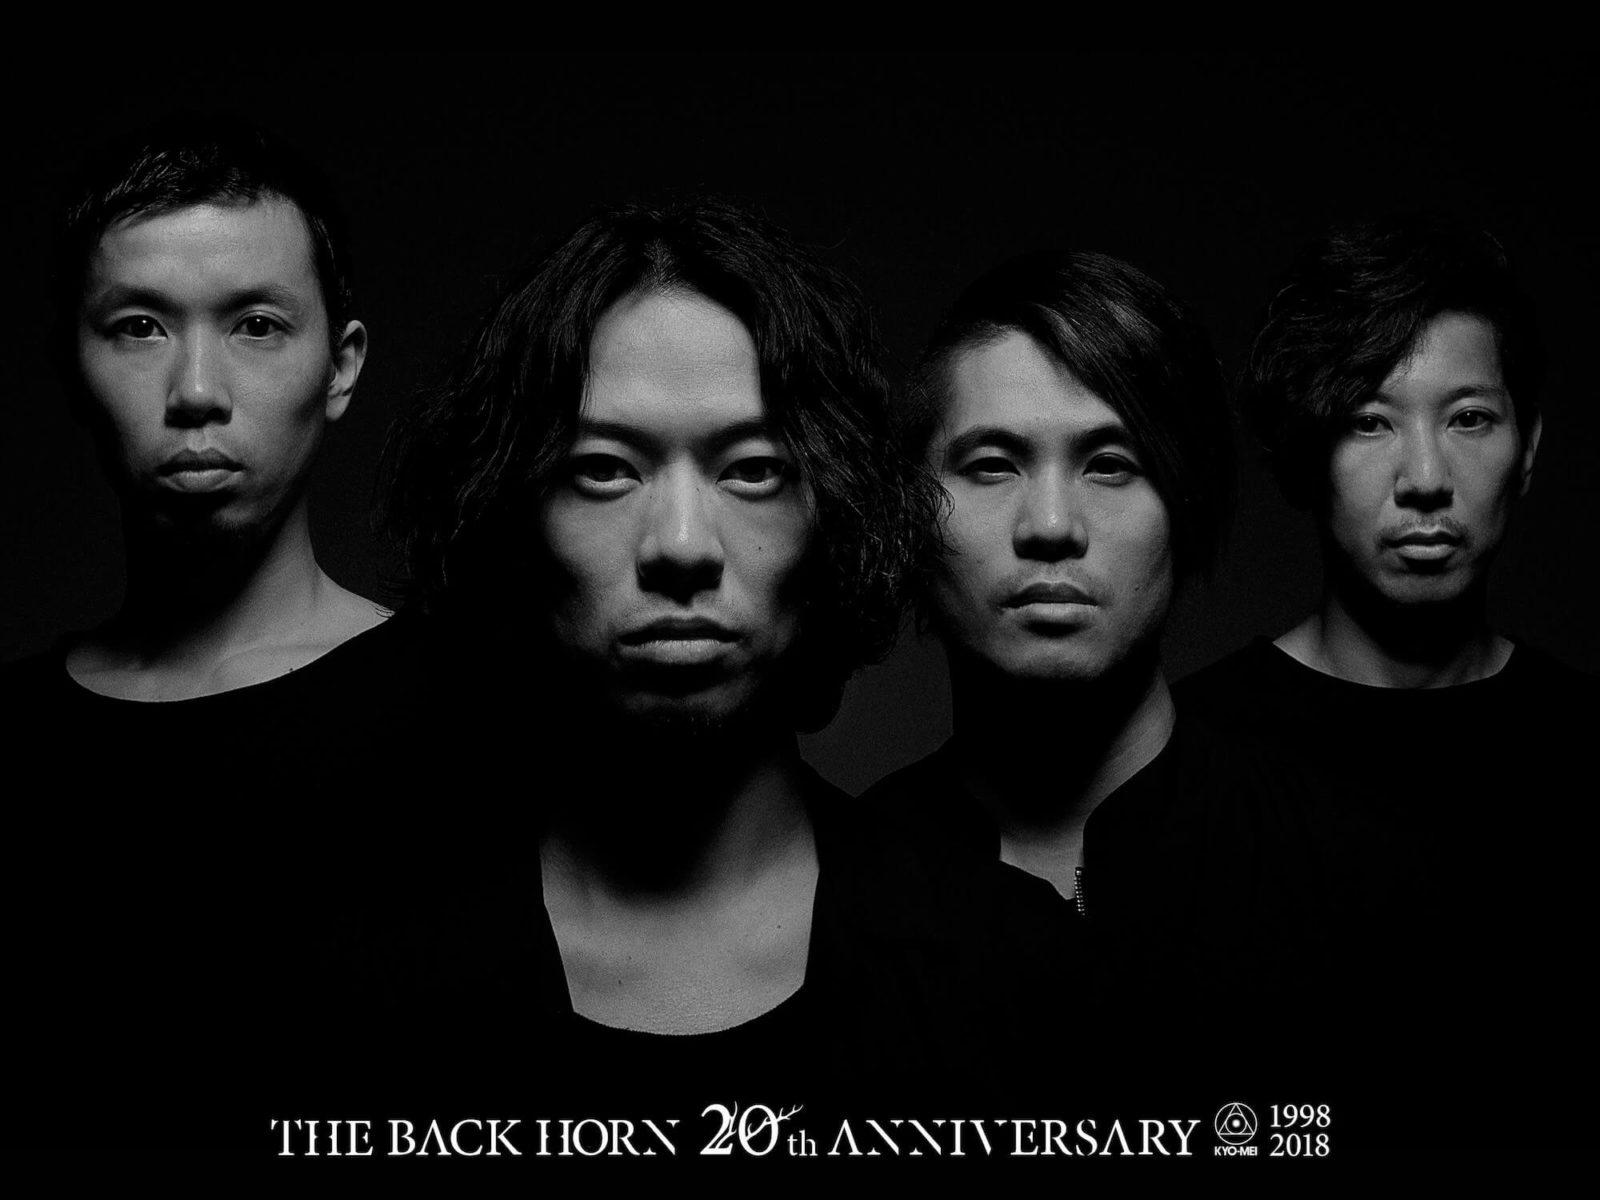 THE BACK HORN、結成20周年の集大成!MV計42タイトルを一斉フル配信サムネイル画像